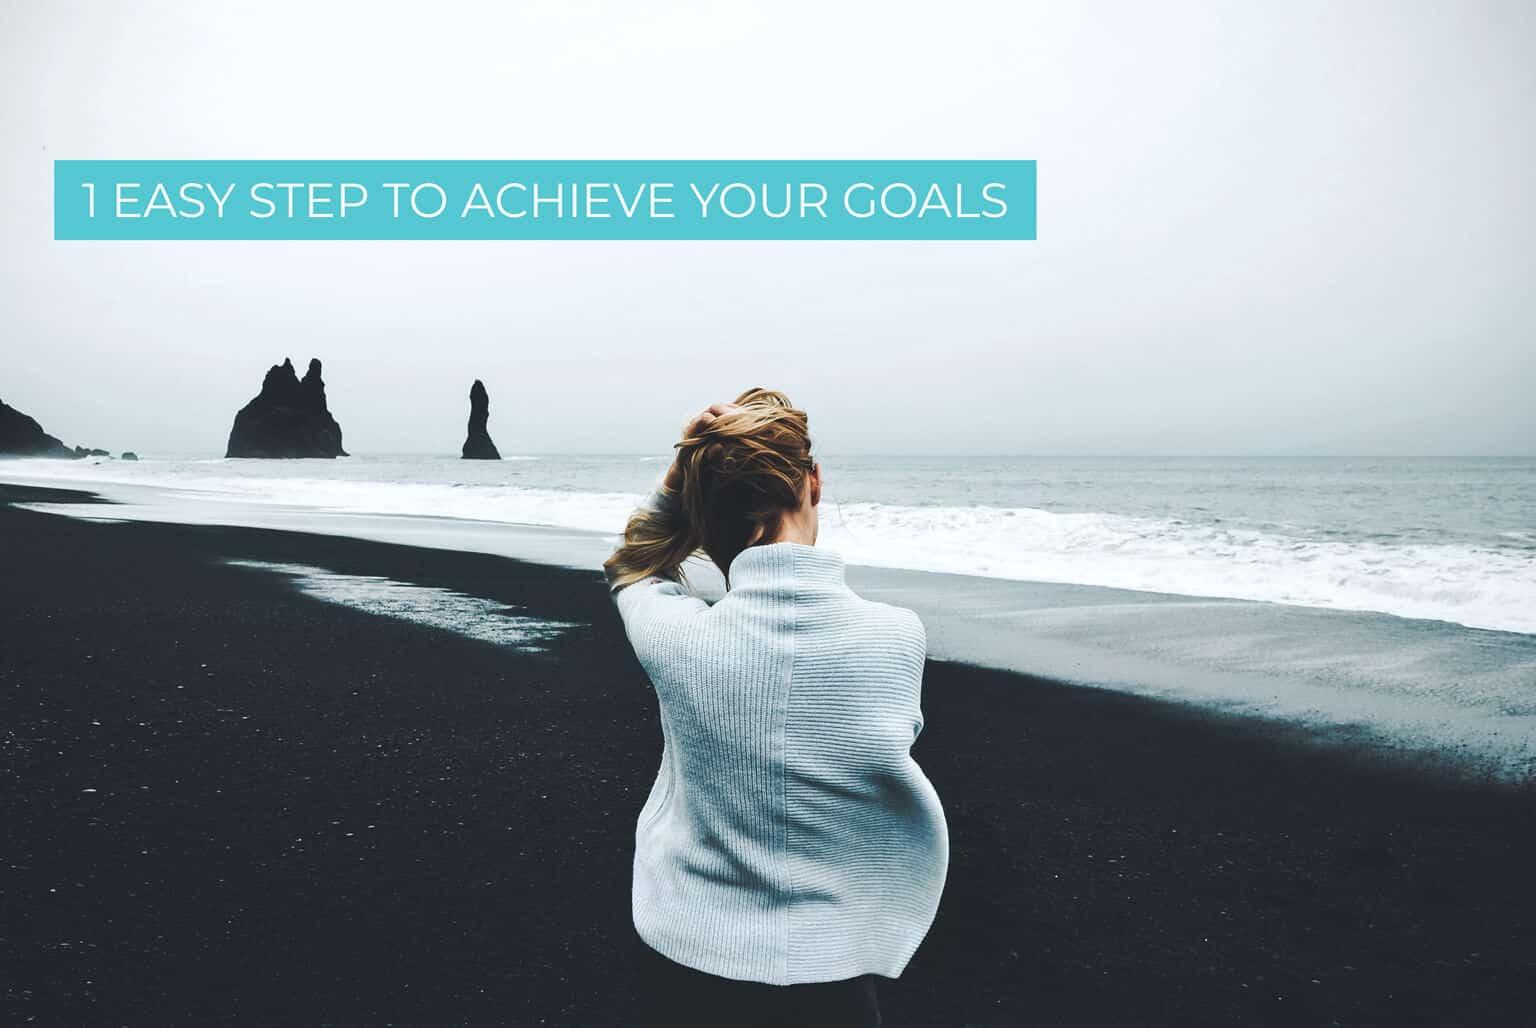 Easy Goal Attainment Step